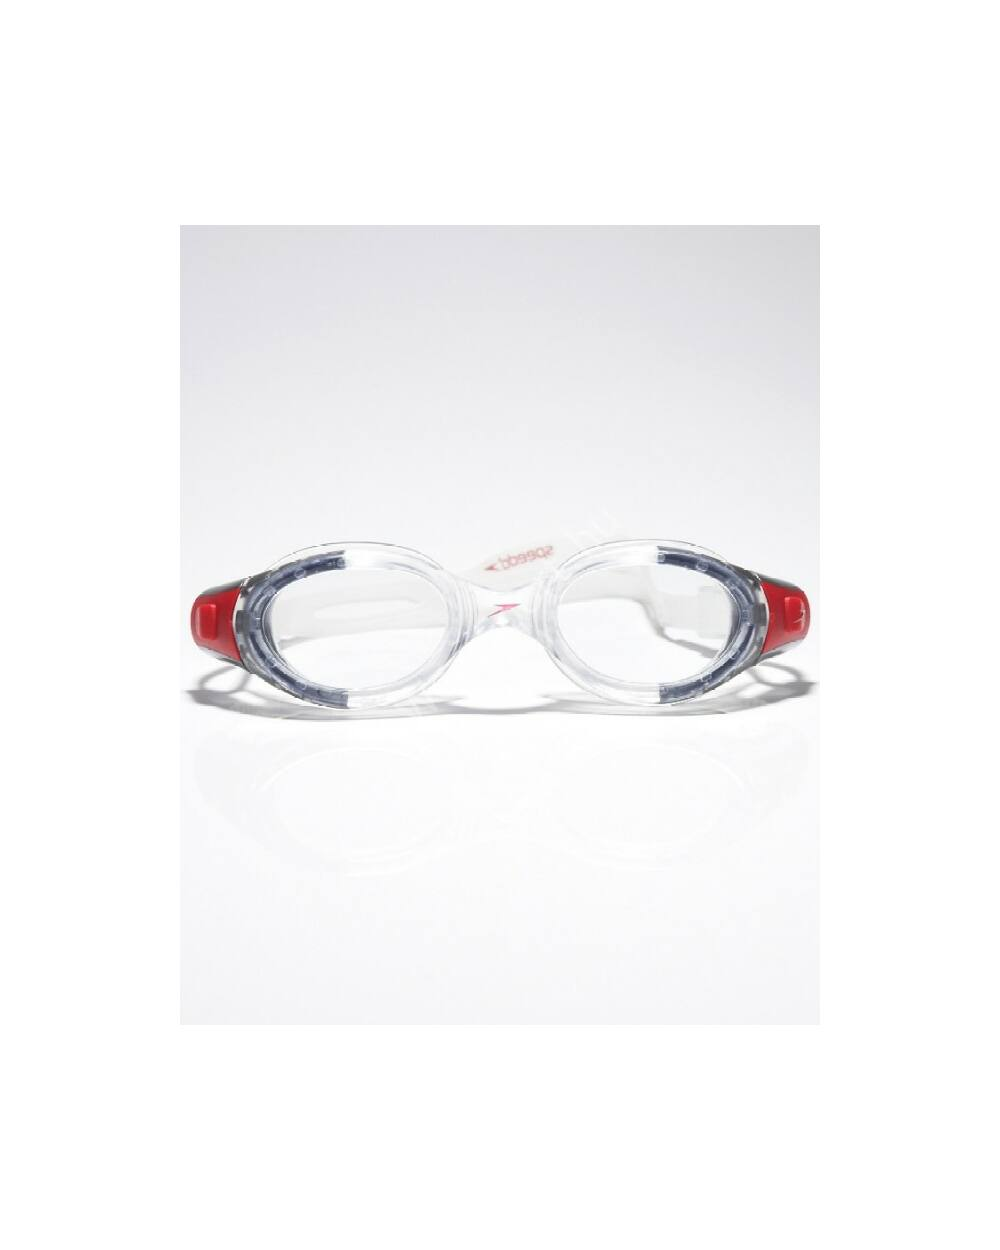 Speedo futura biofuse úszószemüveg, szürke-piros